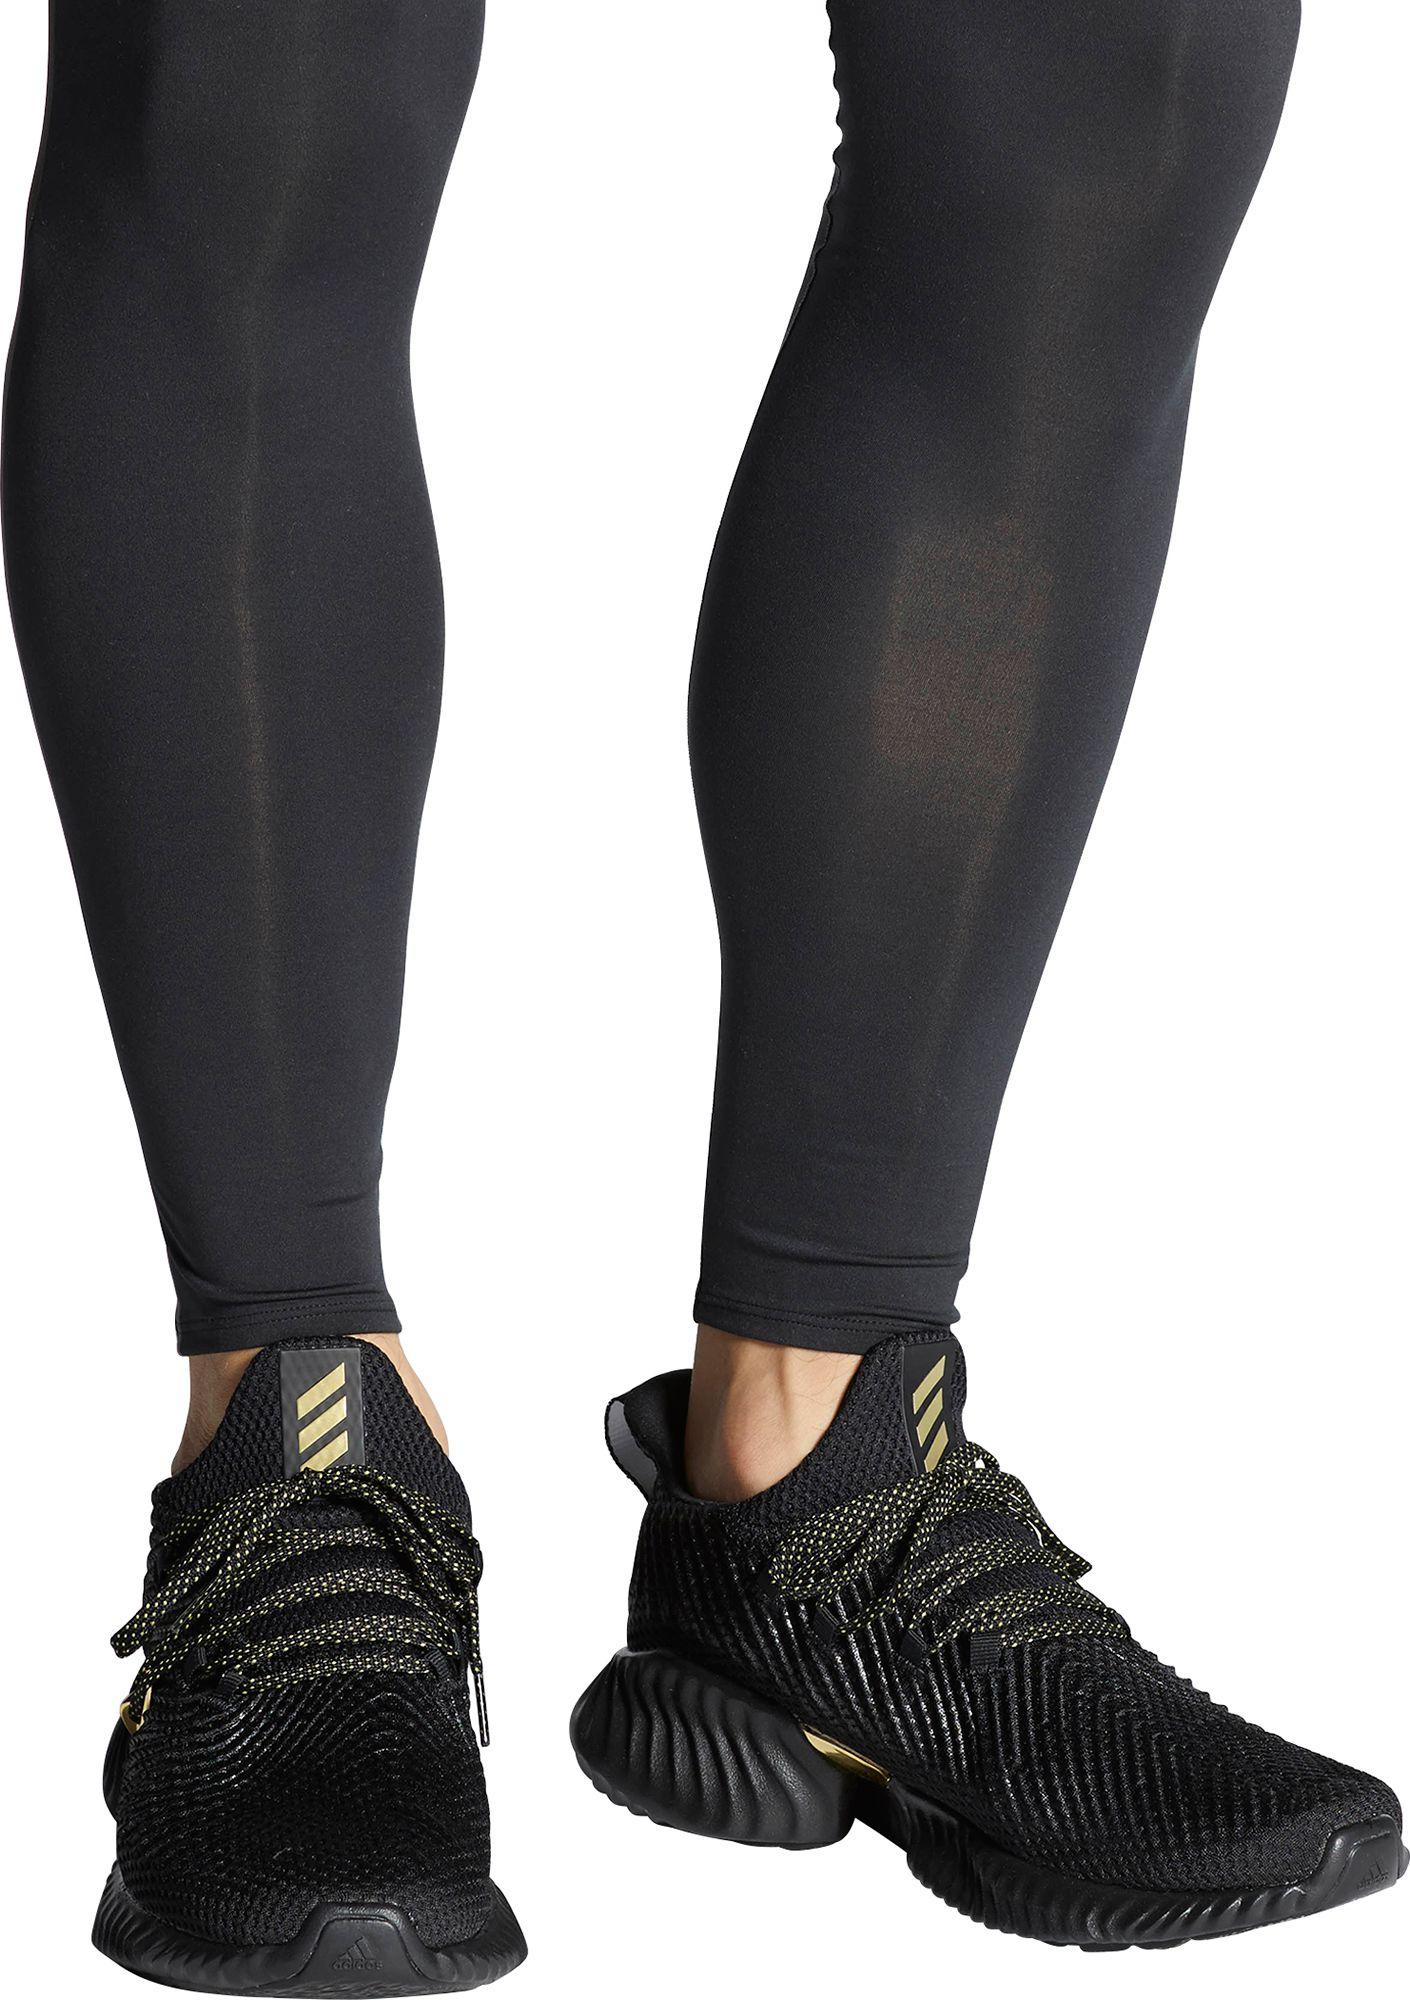 2a76ddc64 Adidas - Black Alphabounce Instinct Three Stripe Life Running Shoes for Men  - Lyst. View fullscreen